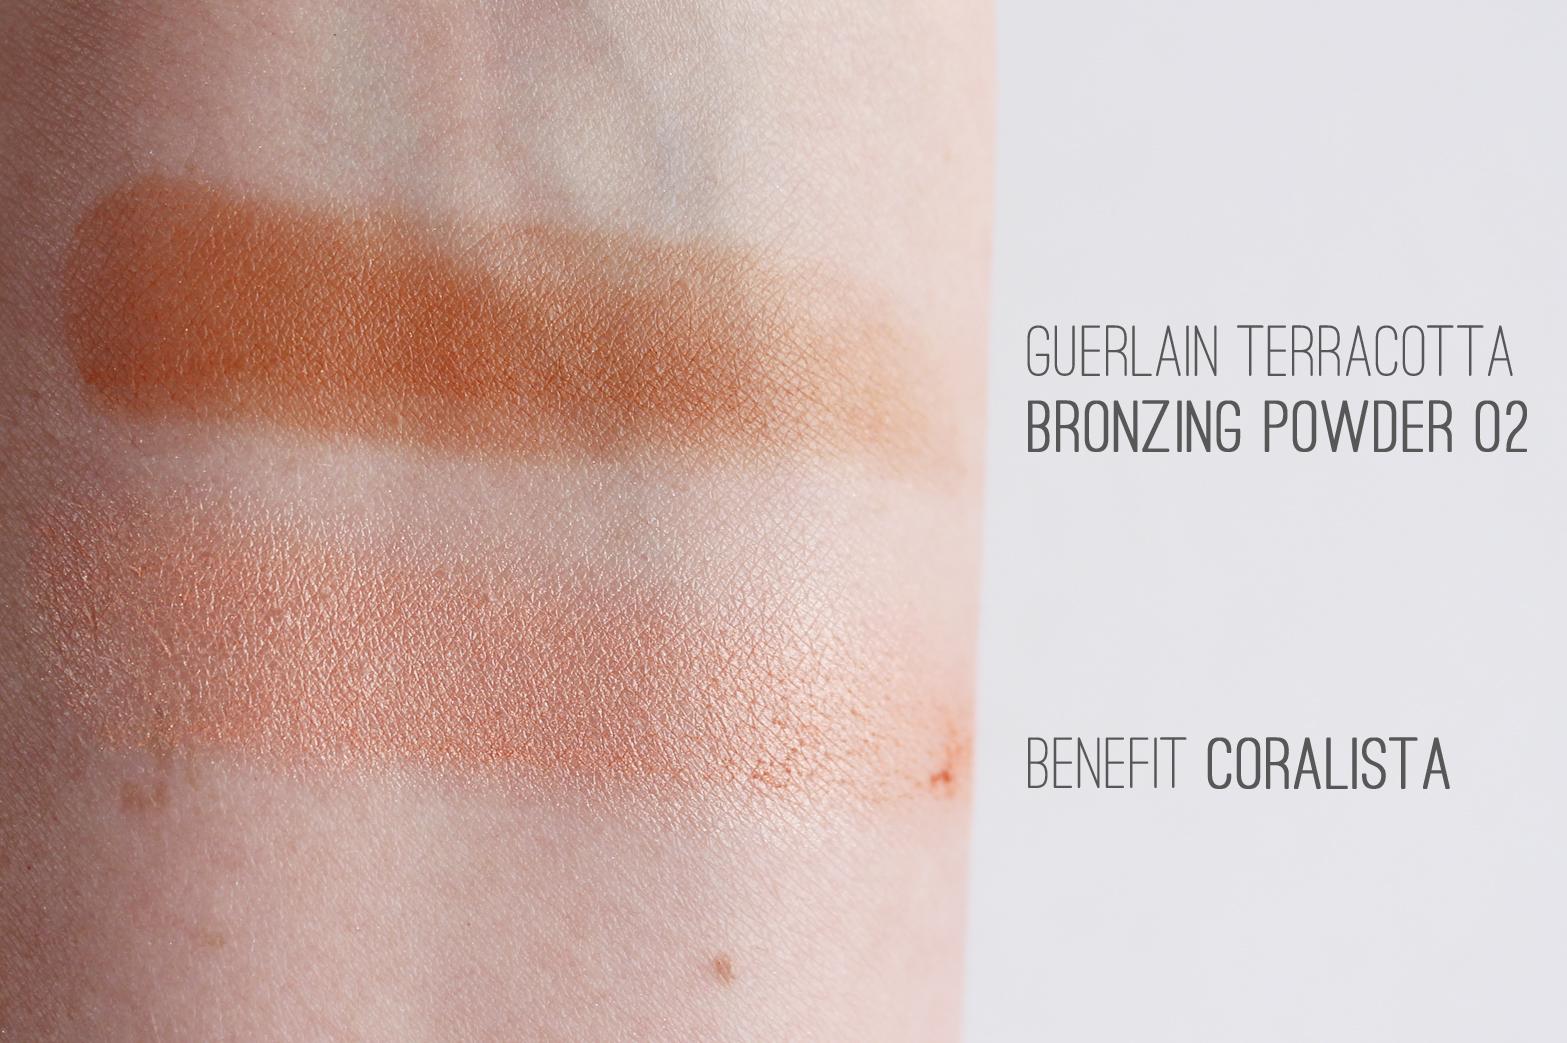 COSME-DE.COM | Haul - Guerlain Terracotta Bronzing Powder in 02 + Benefit Coralista Blush - CassandraMyee